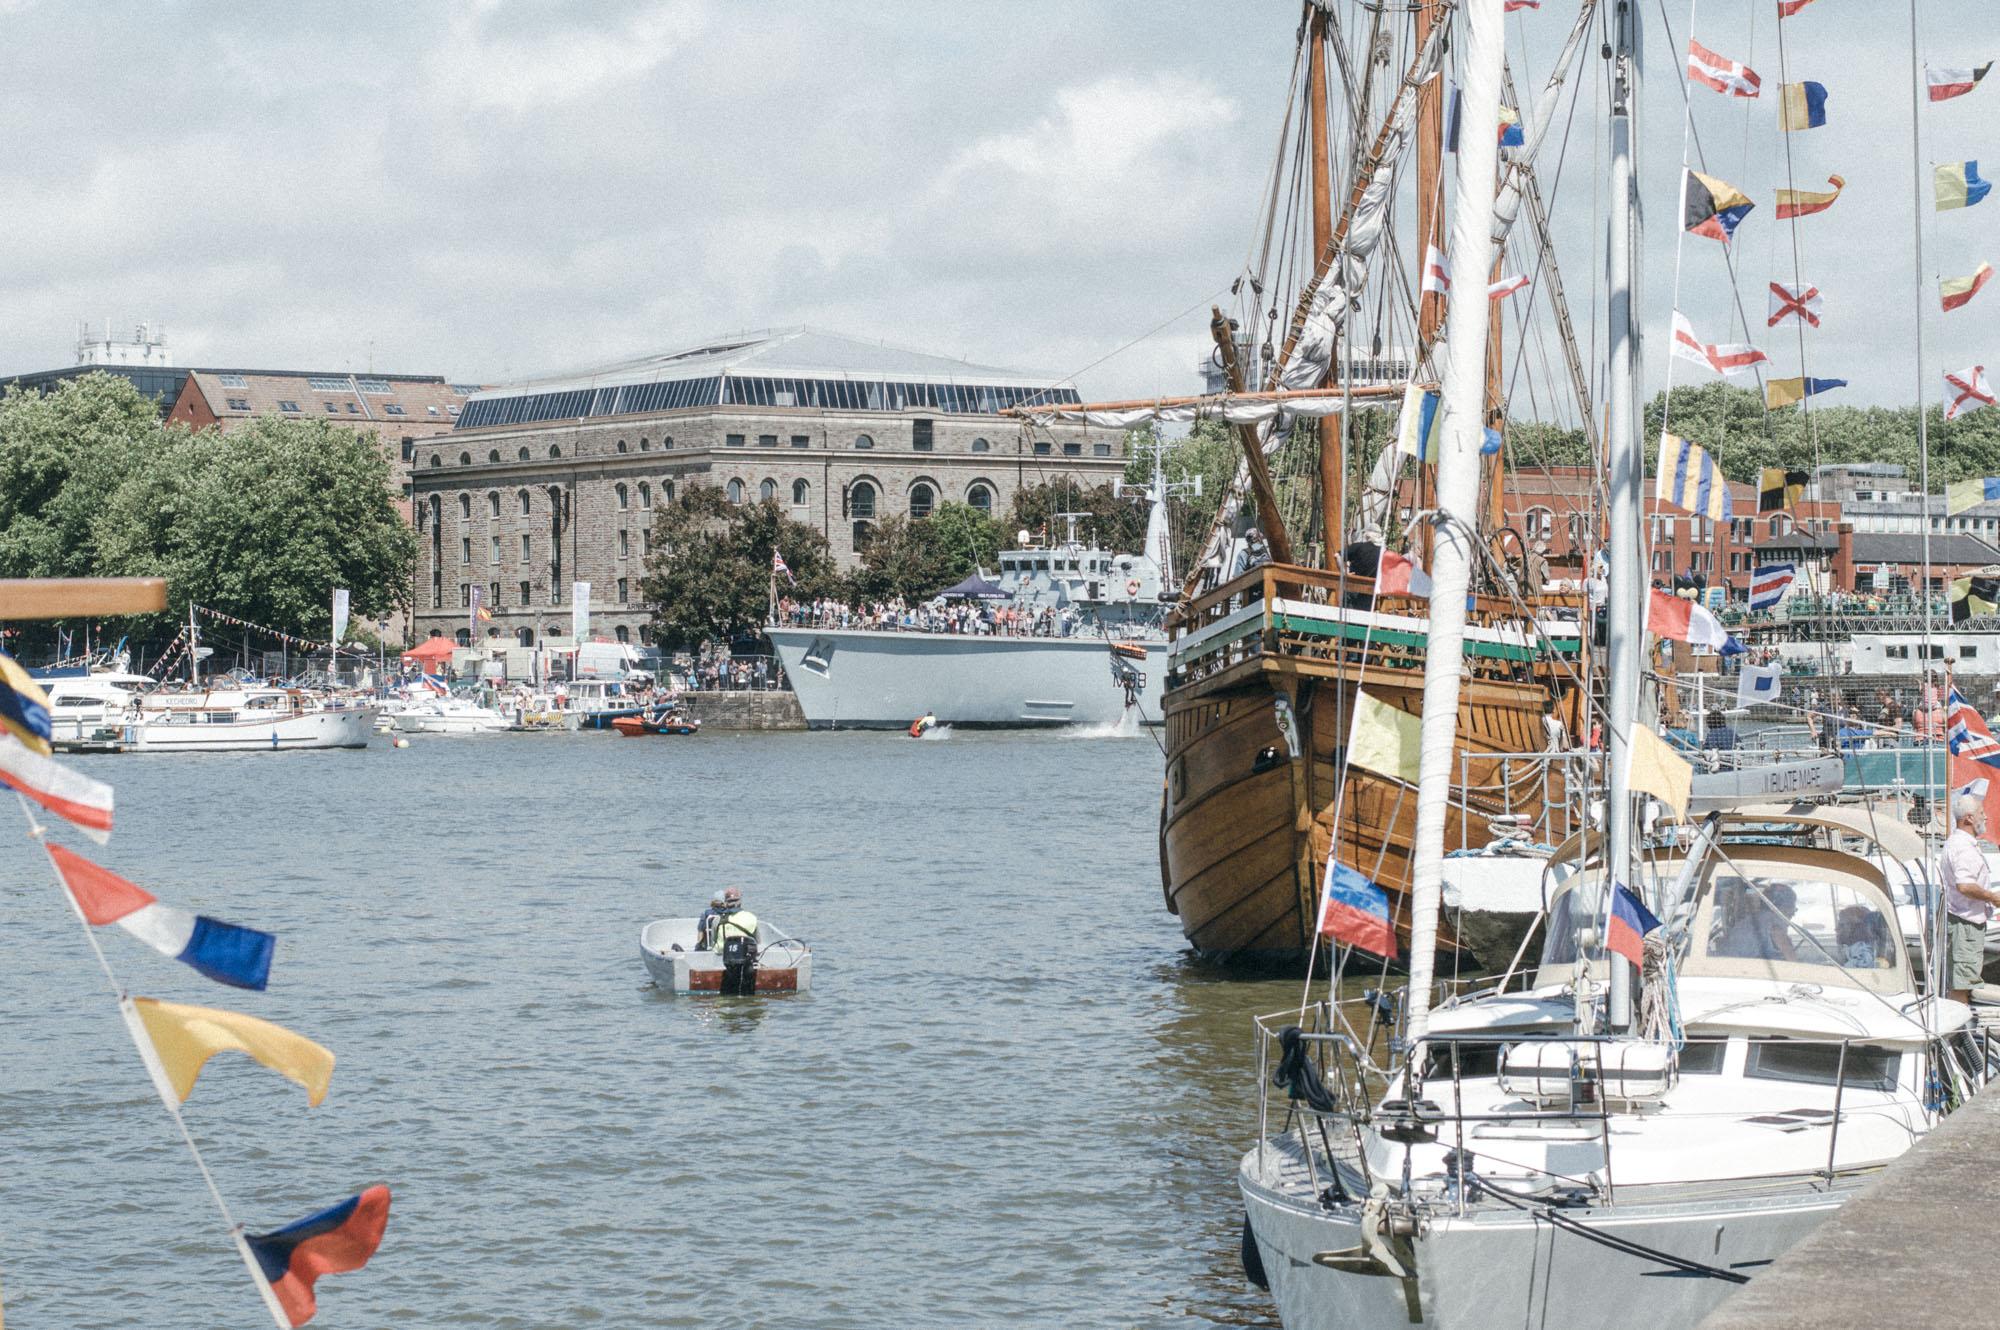 Lou Archell harbour festival July 2016